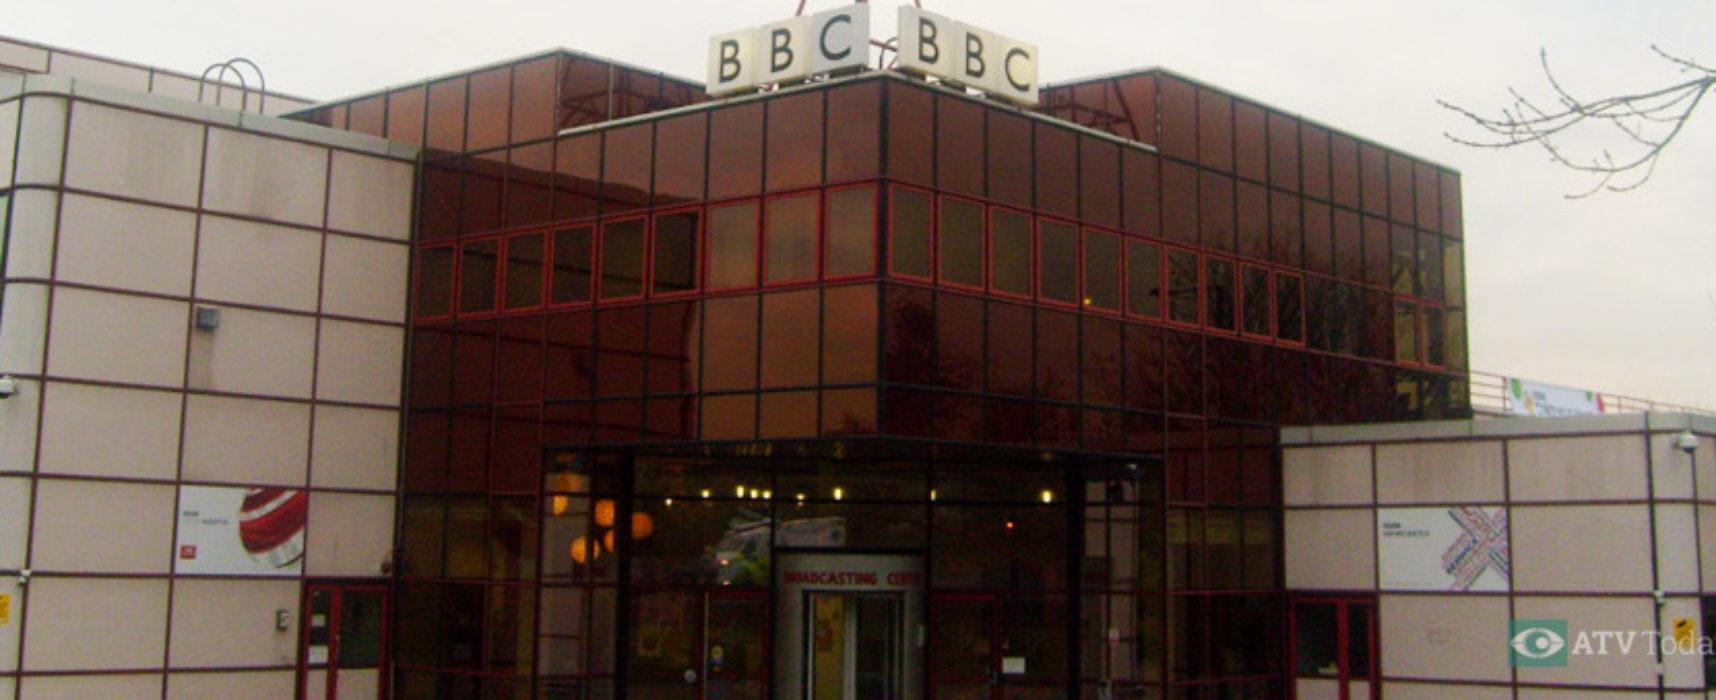 BBC to axe local news, create super regions?